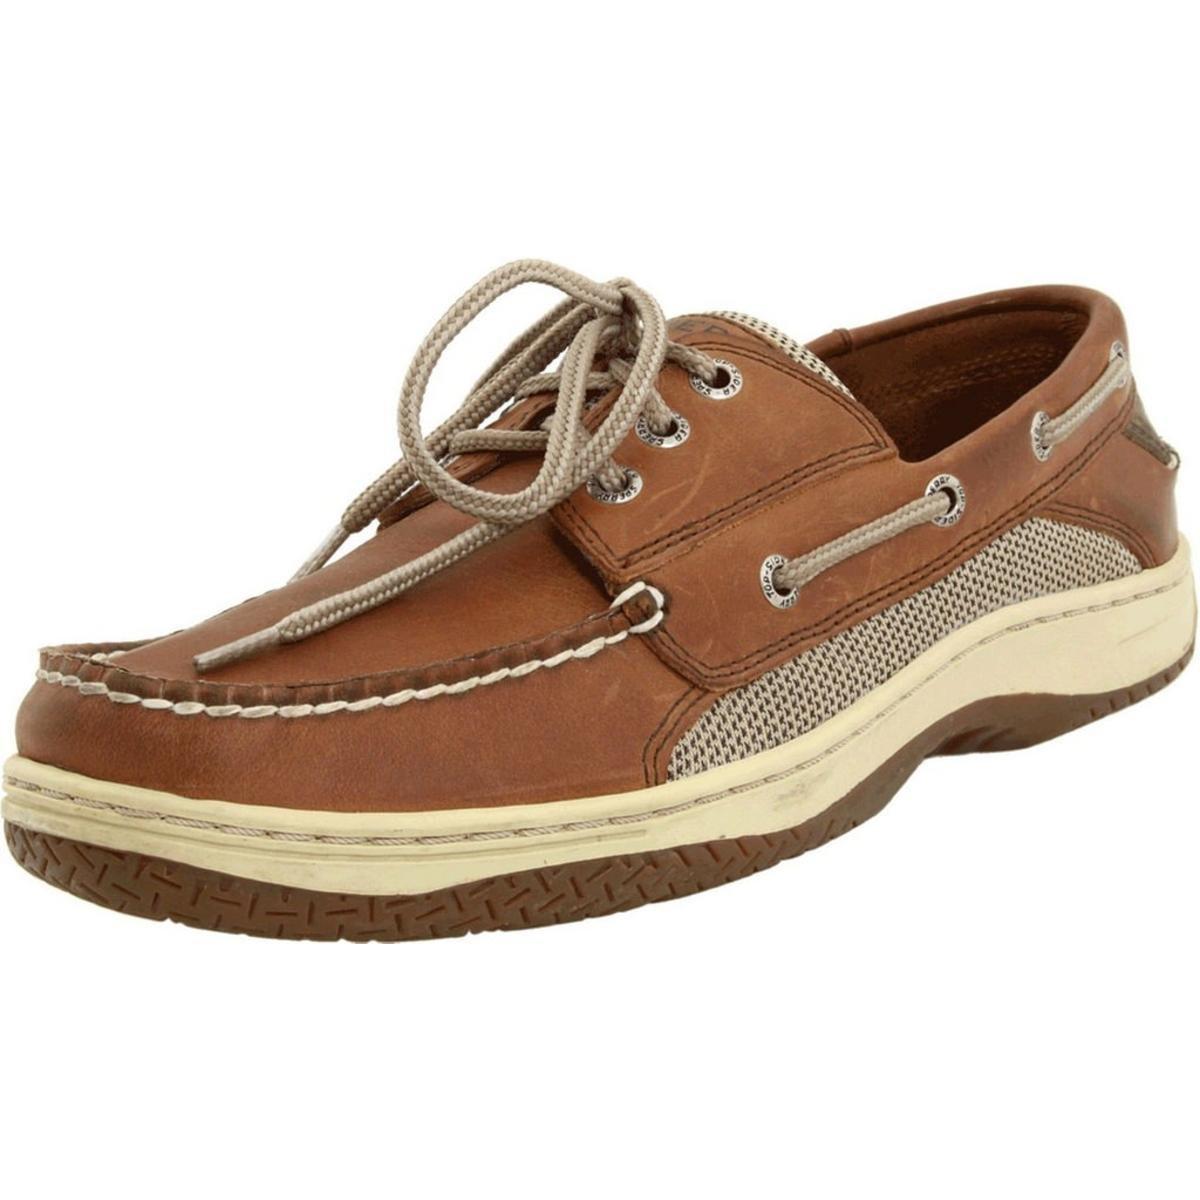 Sperry Top-Sider Men's Billfish 3-Eye Boat Shoe, Dark Tan, 9.5 M US